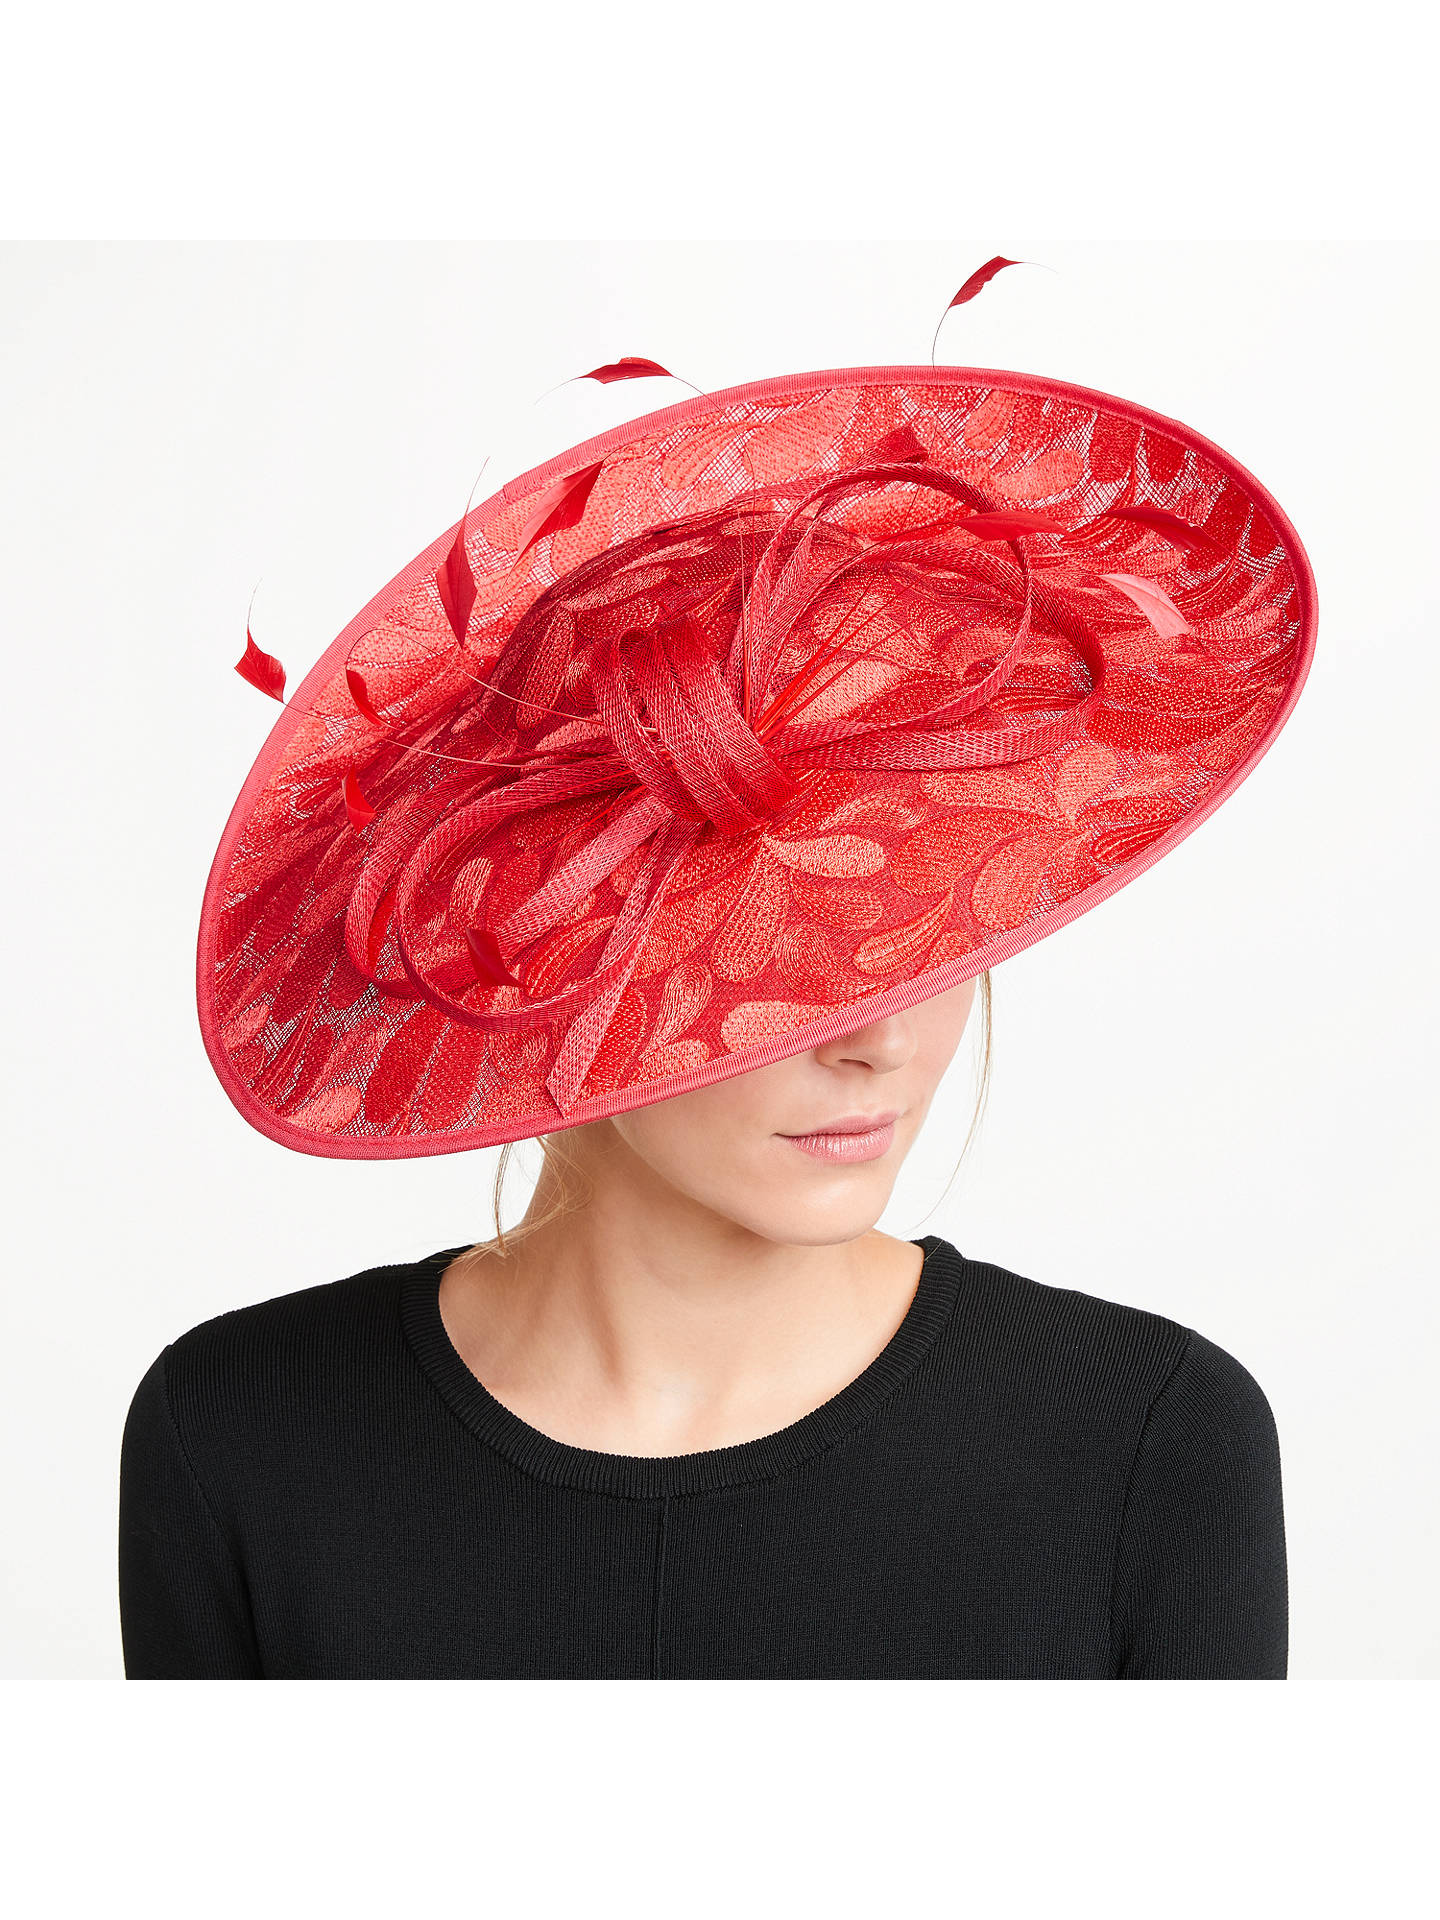 b656b2d5899eb Buy Vixen Millinery Skyler Lace Effect Occasion Hat